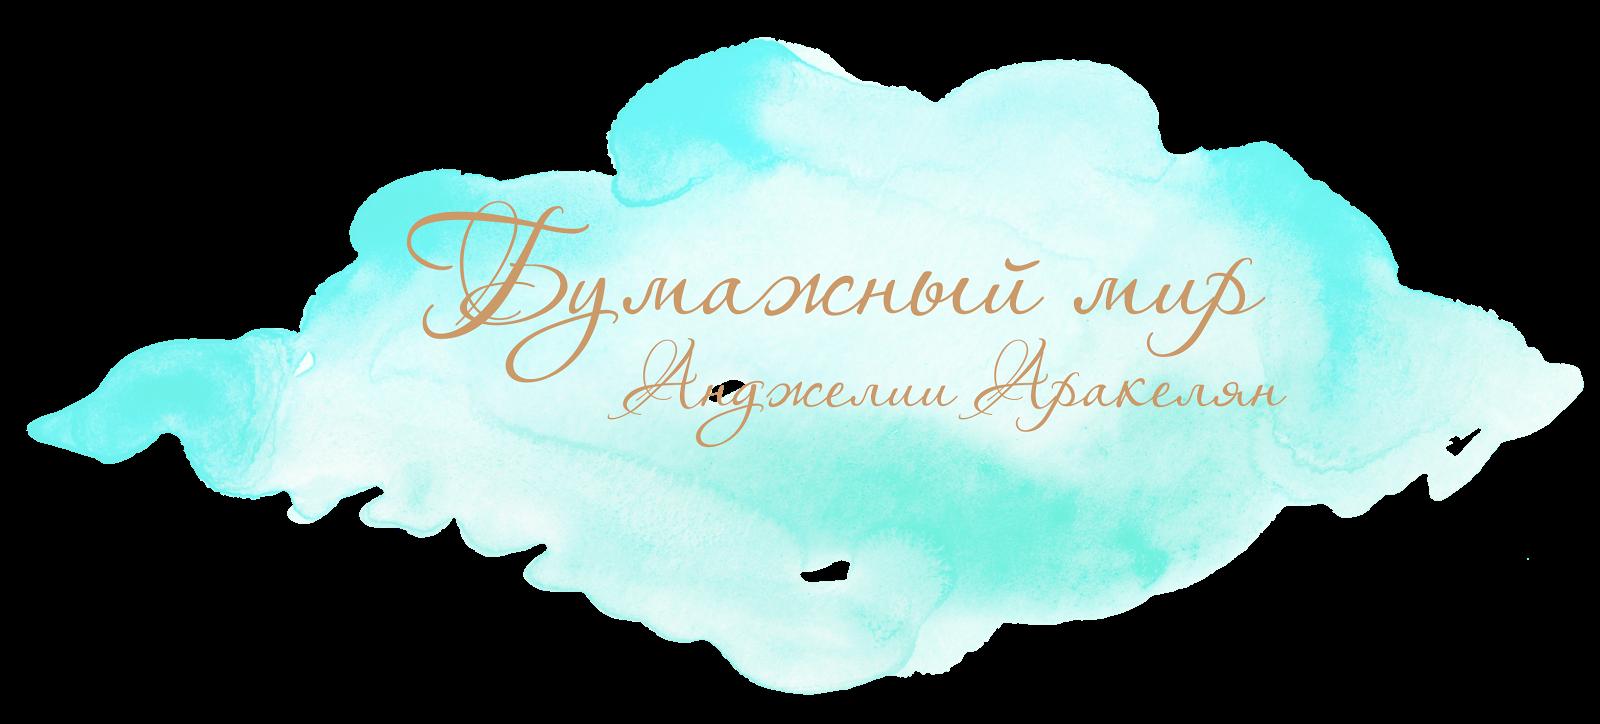 Бумажный мир Анджелии Аракелян